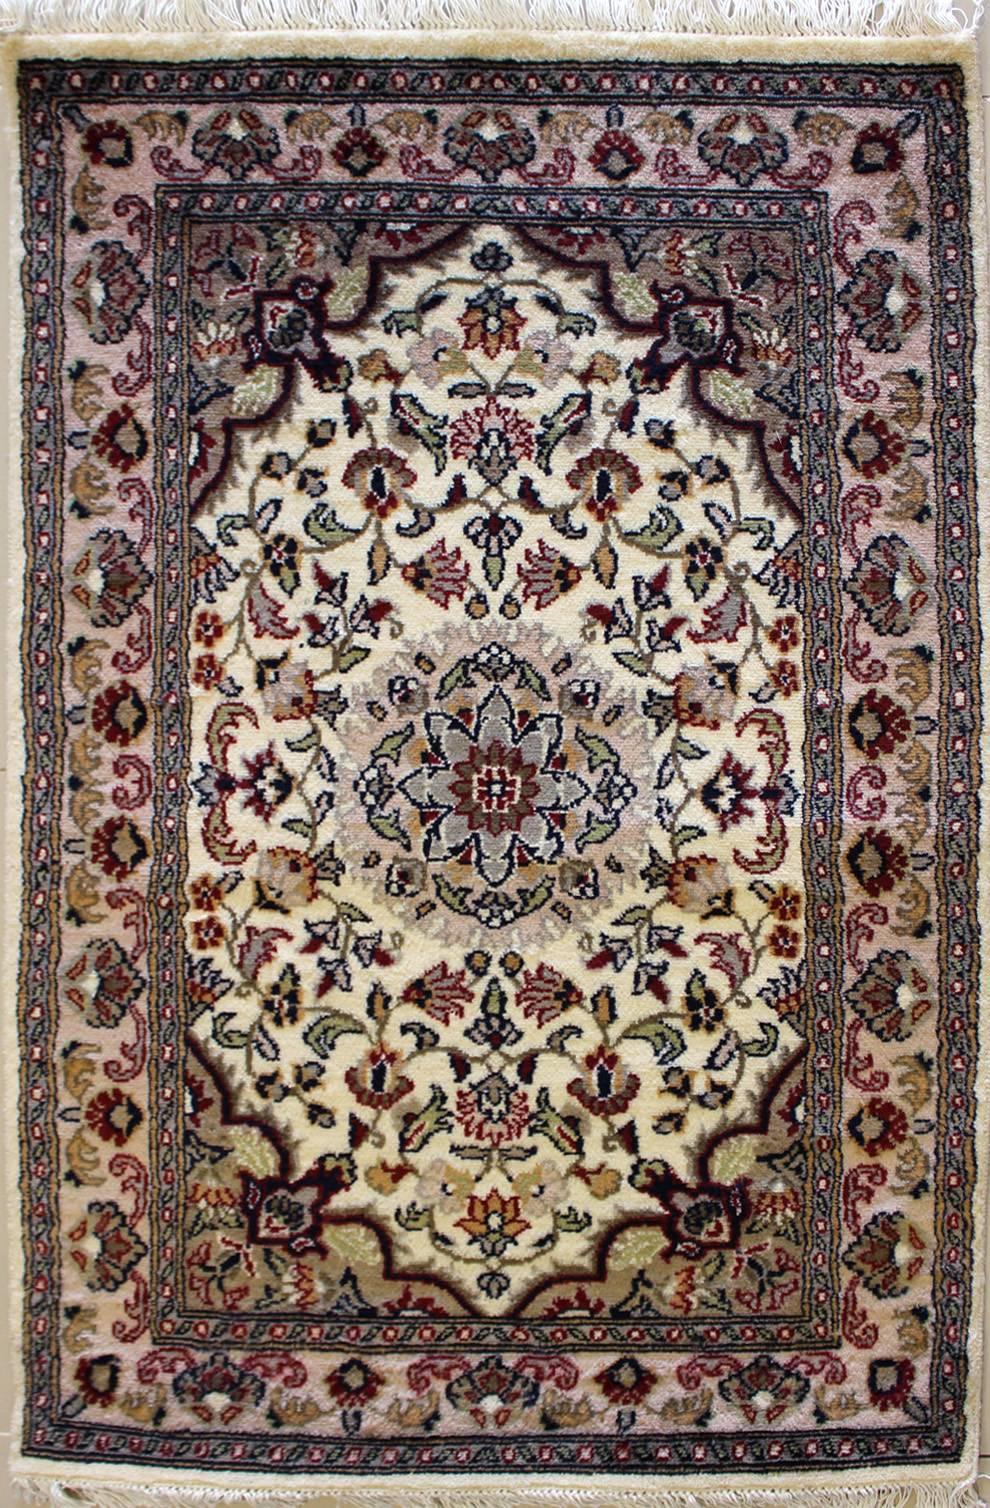 2u00276x4u00272 Rug   Floral   Handmade Pak Persian High Quality Rugs   A 2x4 Rug  Size   RugsTC